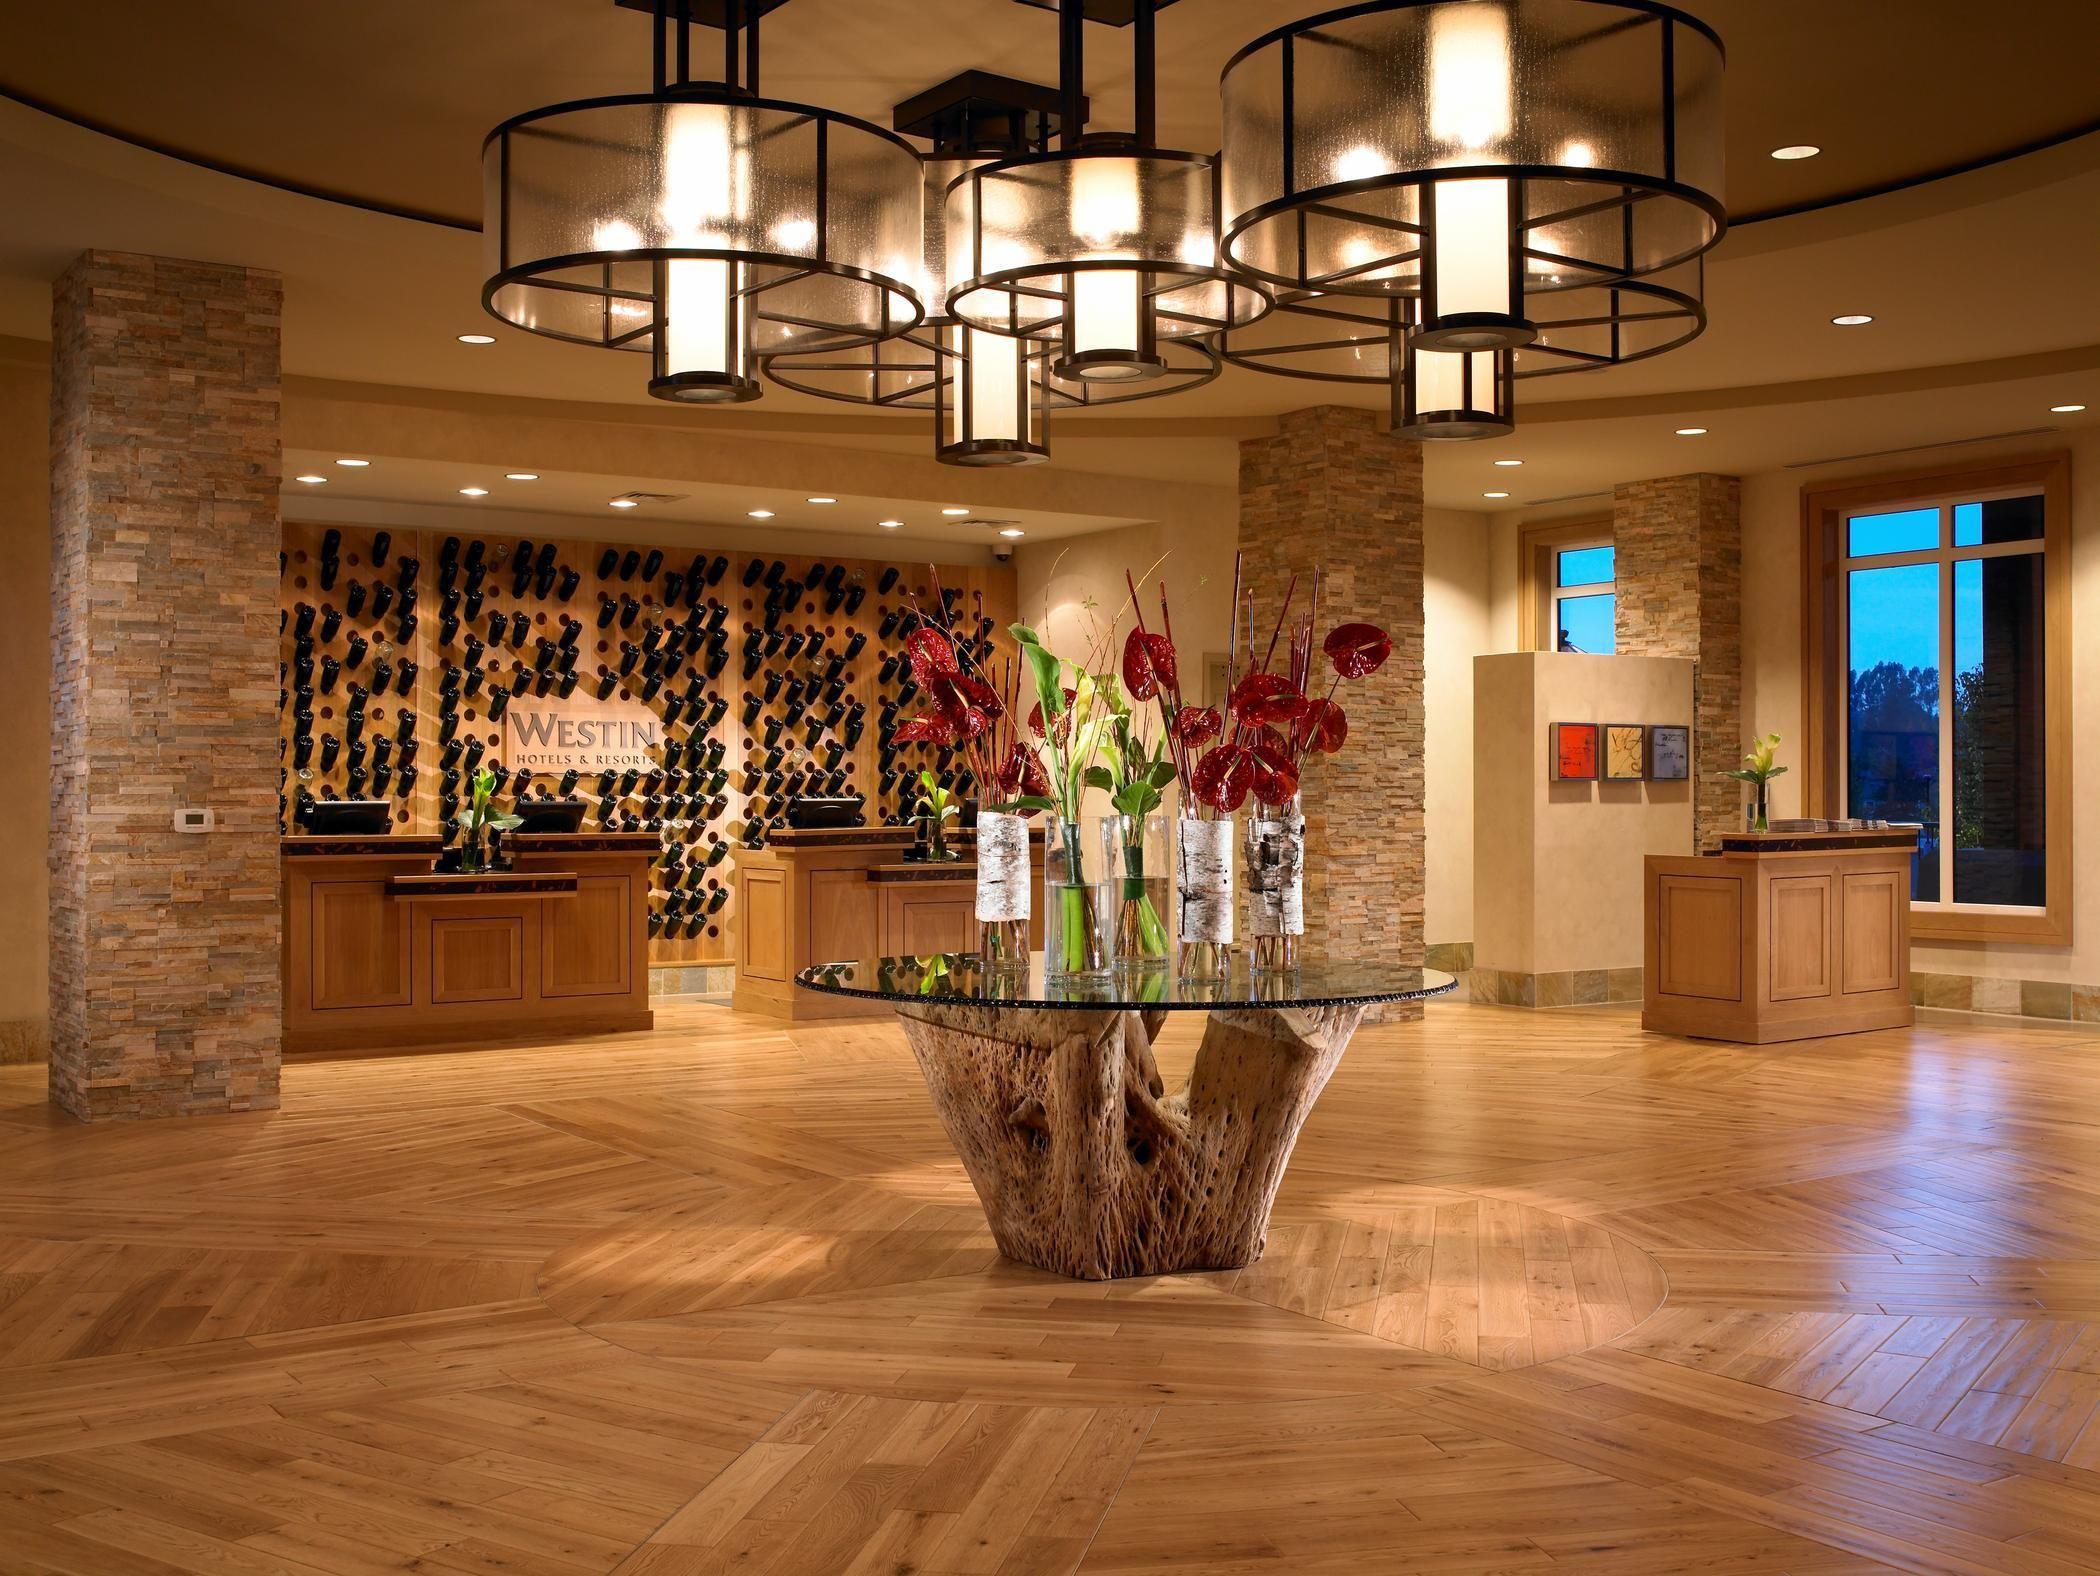 westin napa lobby reception - Wine bottle art wall behind front ...